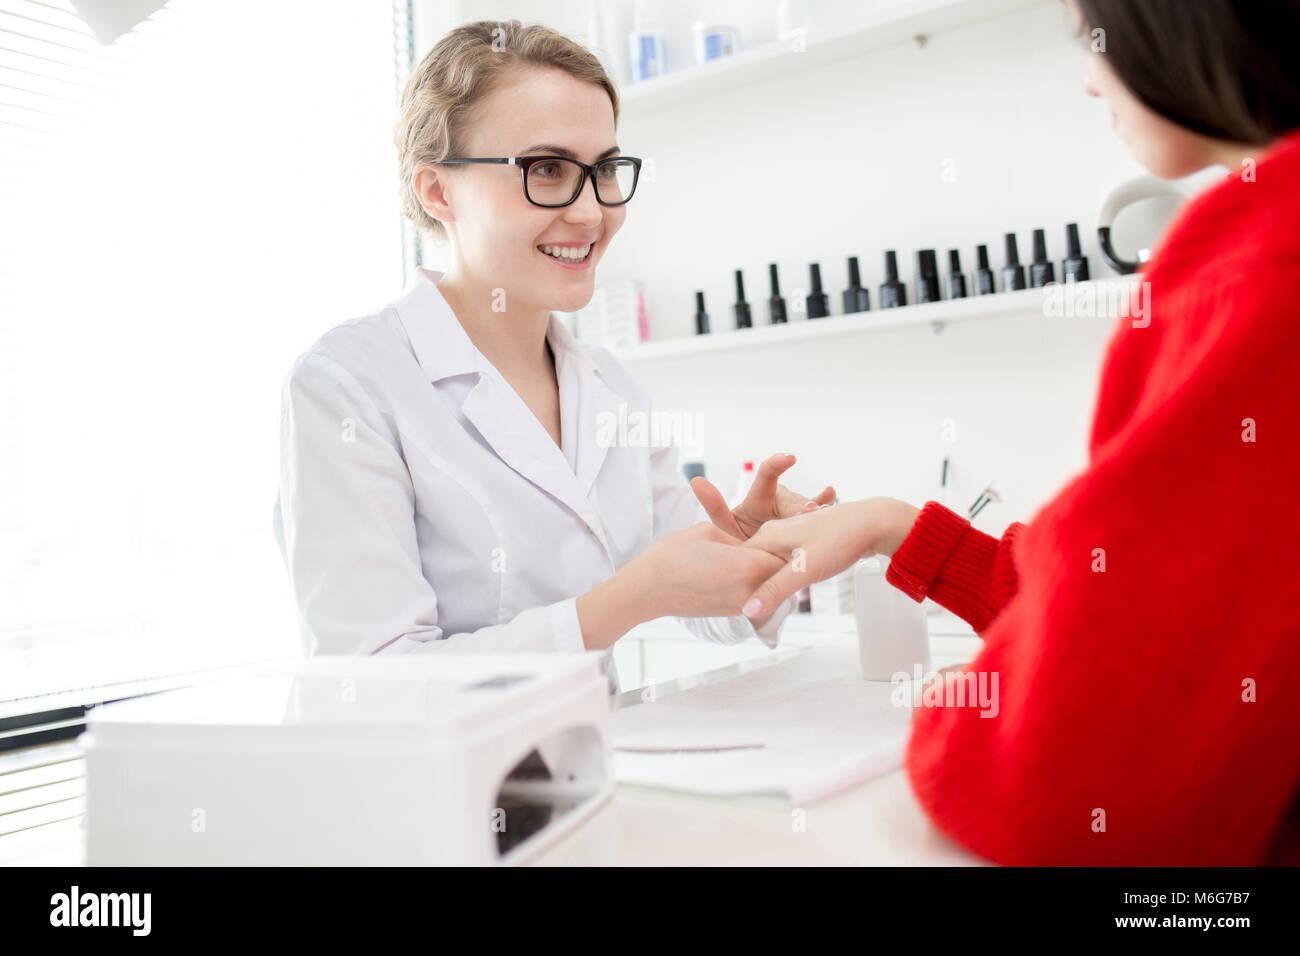 Enjoying Procedure at Nail Salon - Stock Image